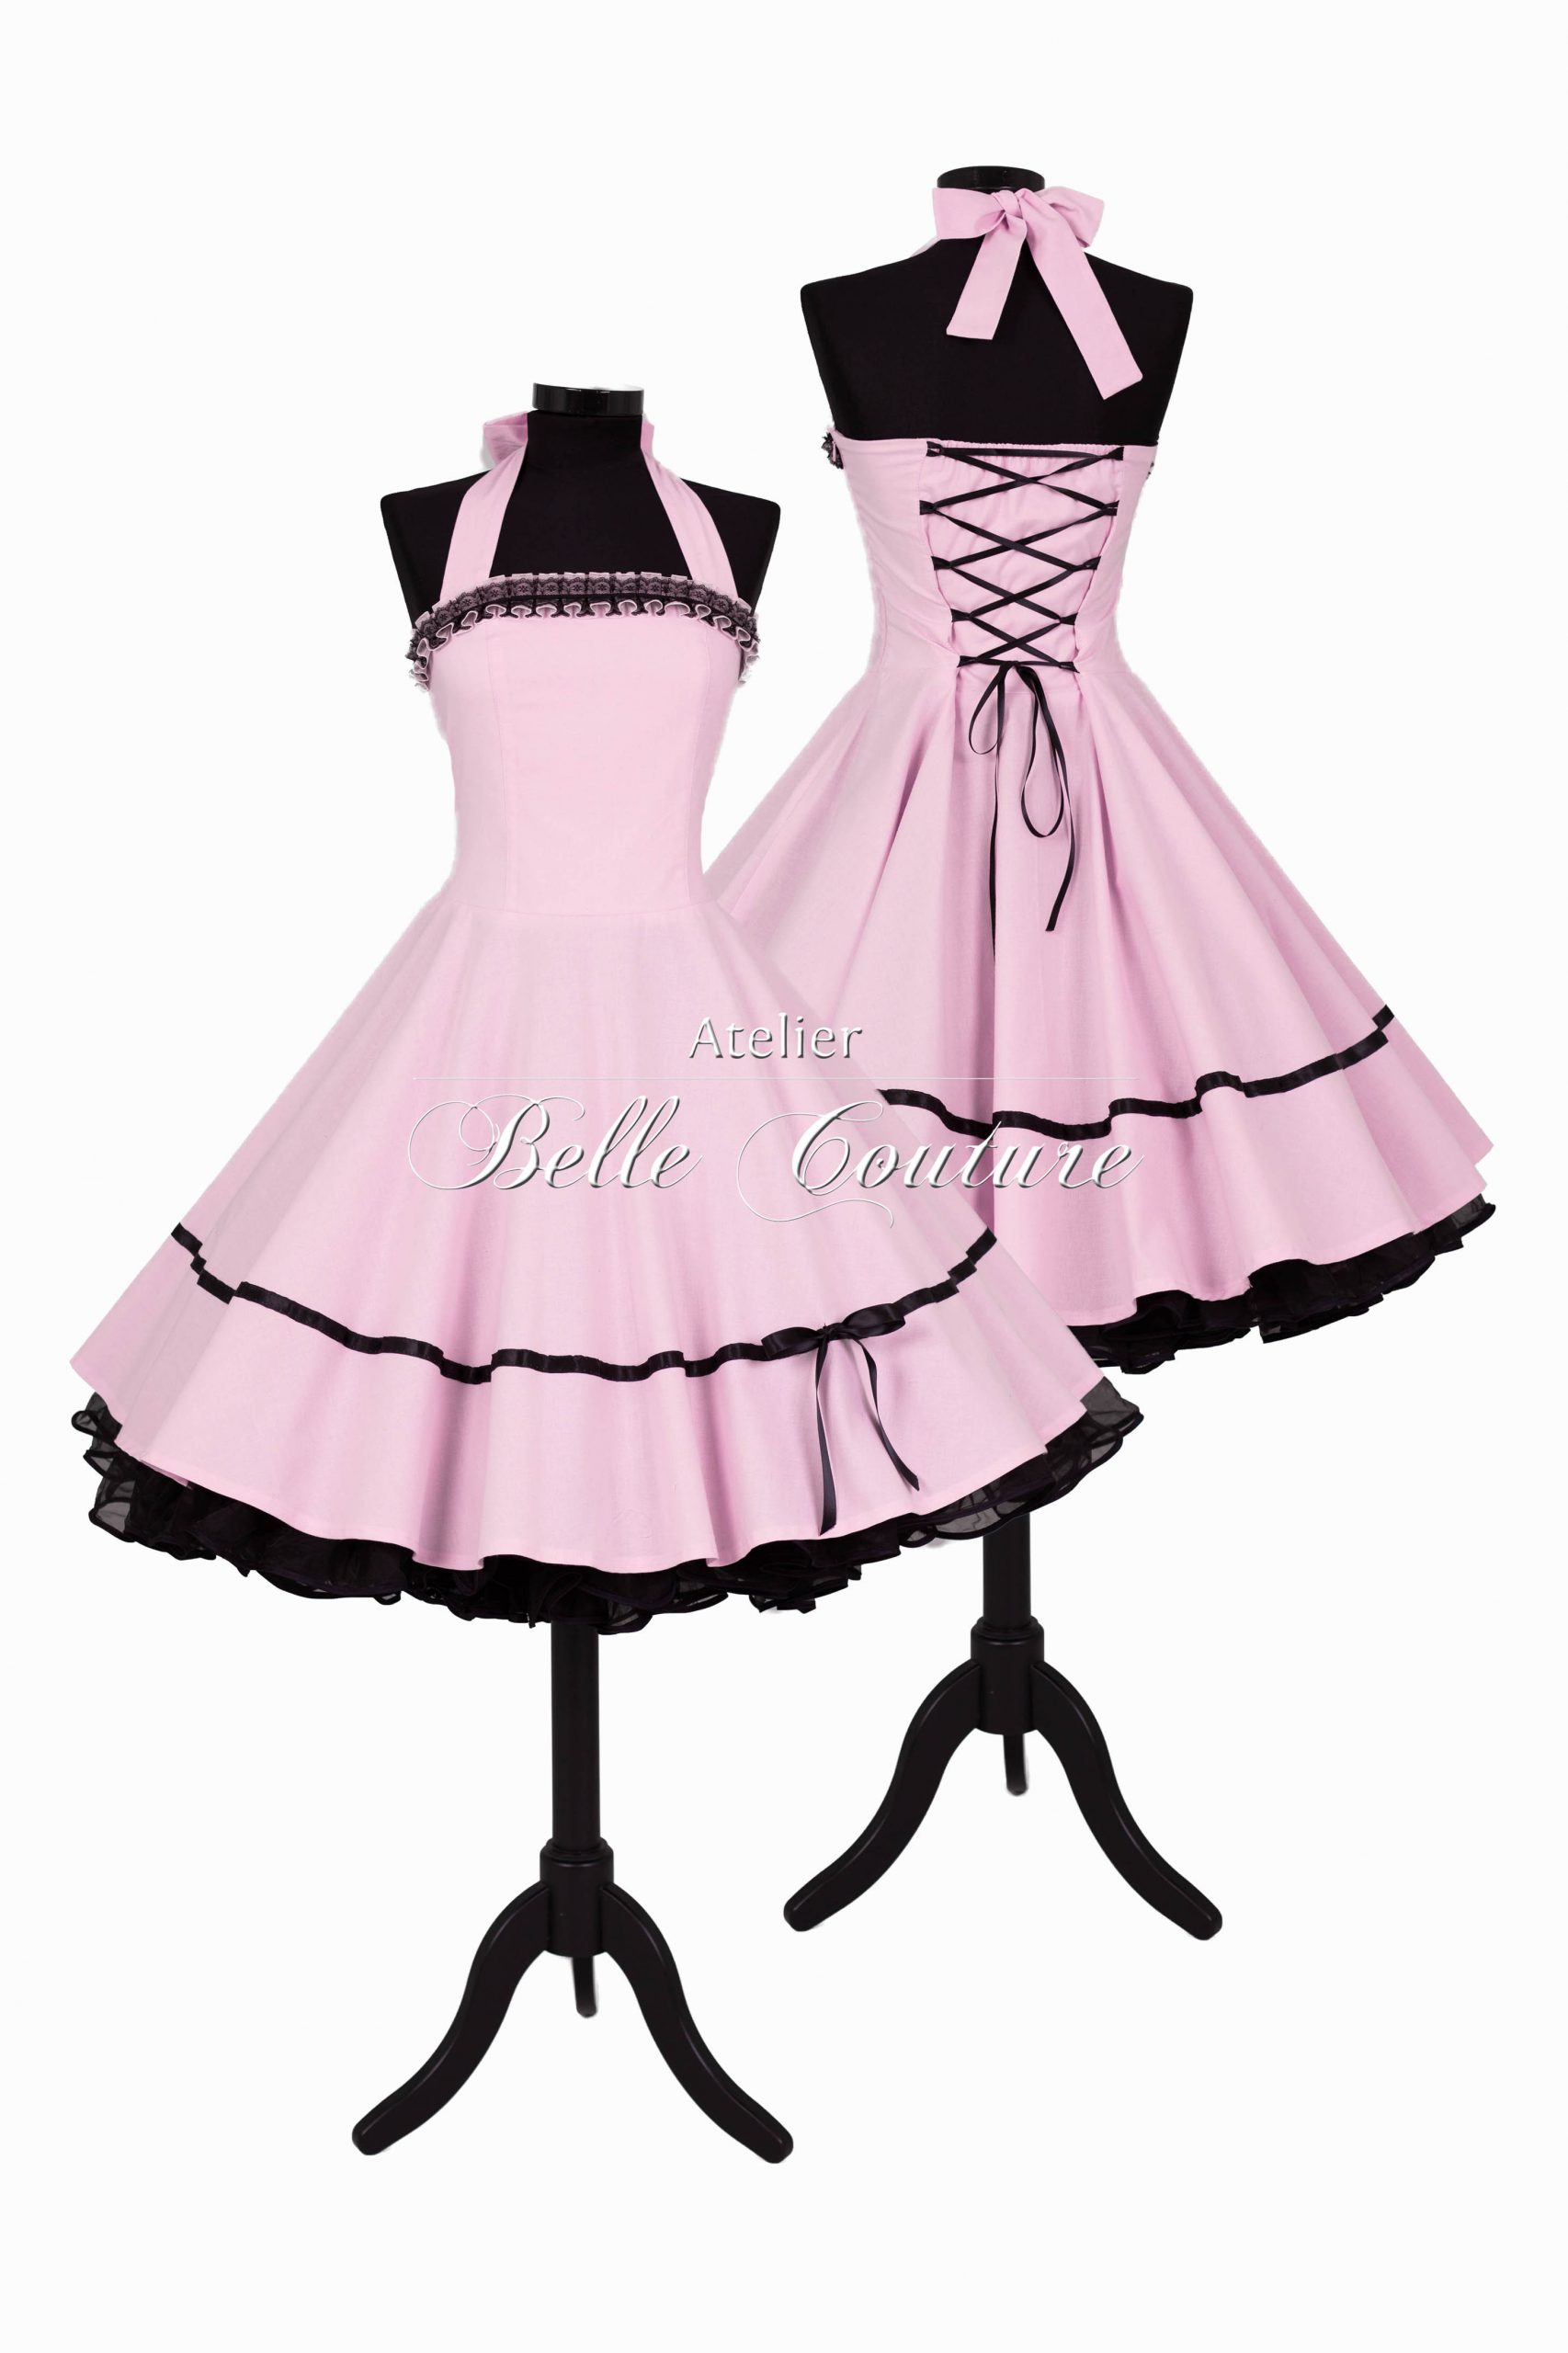 Atelier Belle Couture | Petticoat Kleid Abiball Jugendweihe Brautjungfer